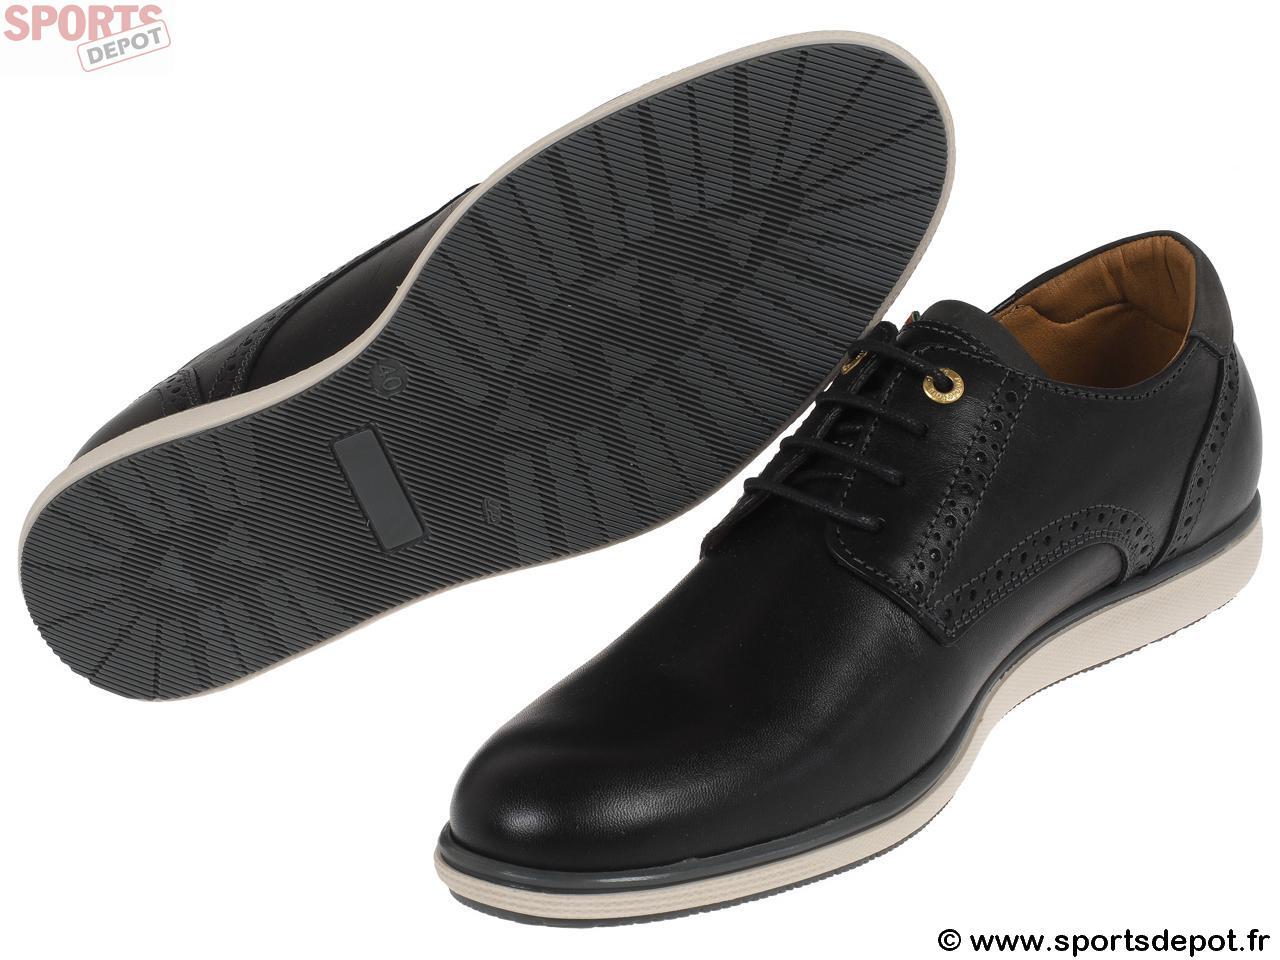 Sangro simili Chaussures Acheter basses low cuir uomo ou PANTOFOLA xzxqfvY